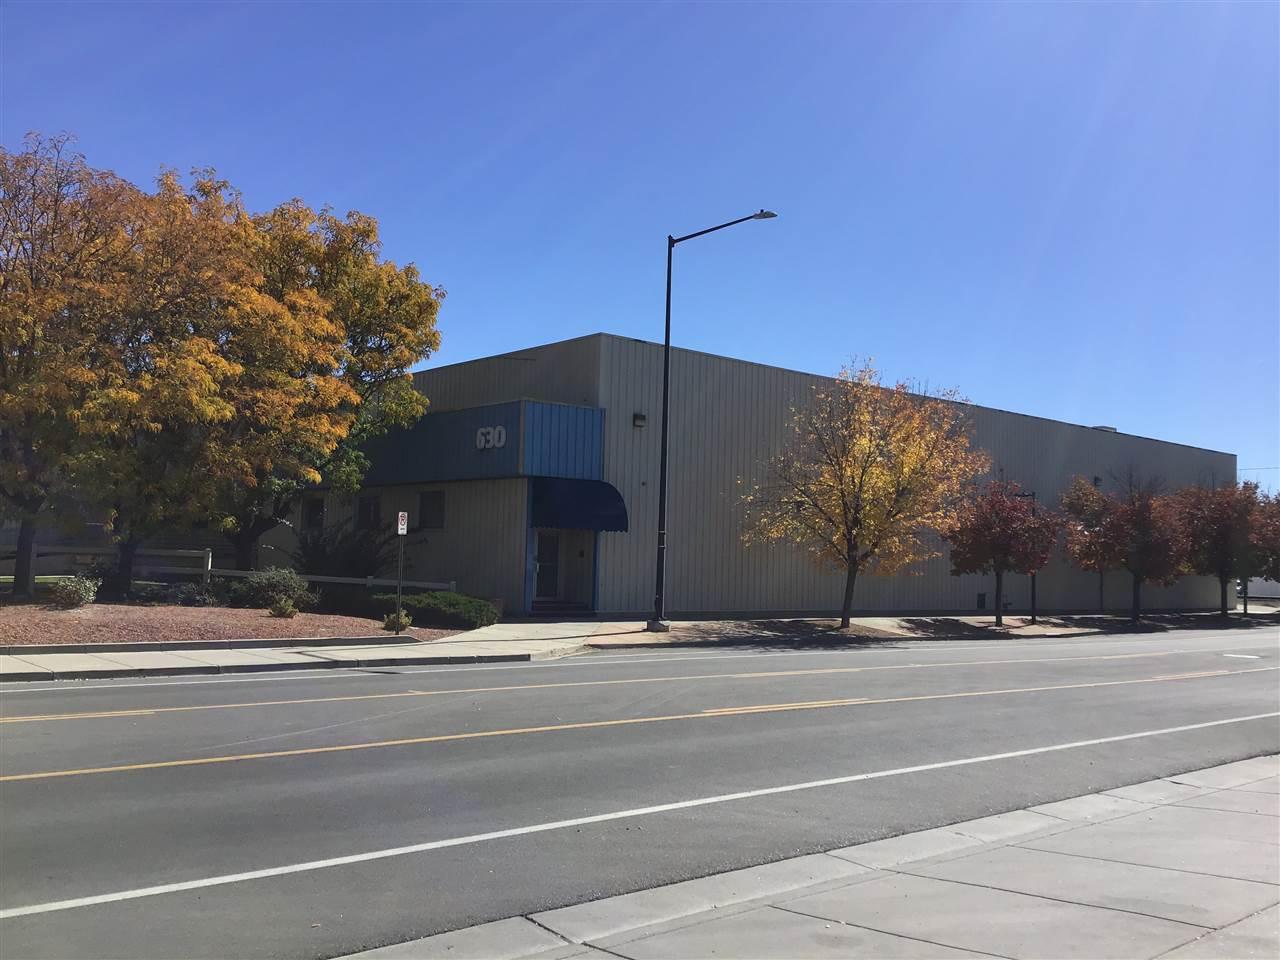 630 S 7th Street Property Photo 1